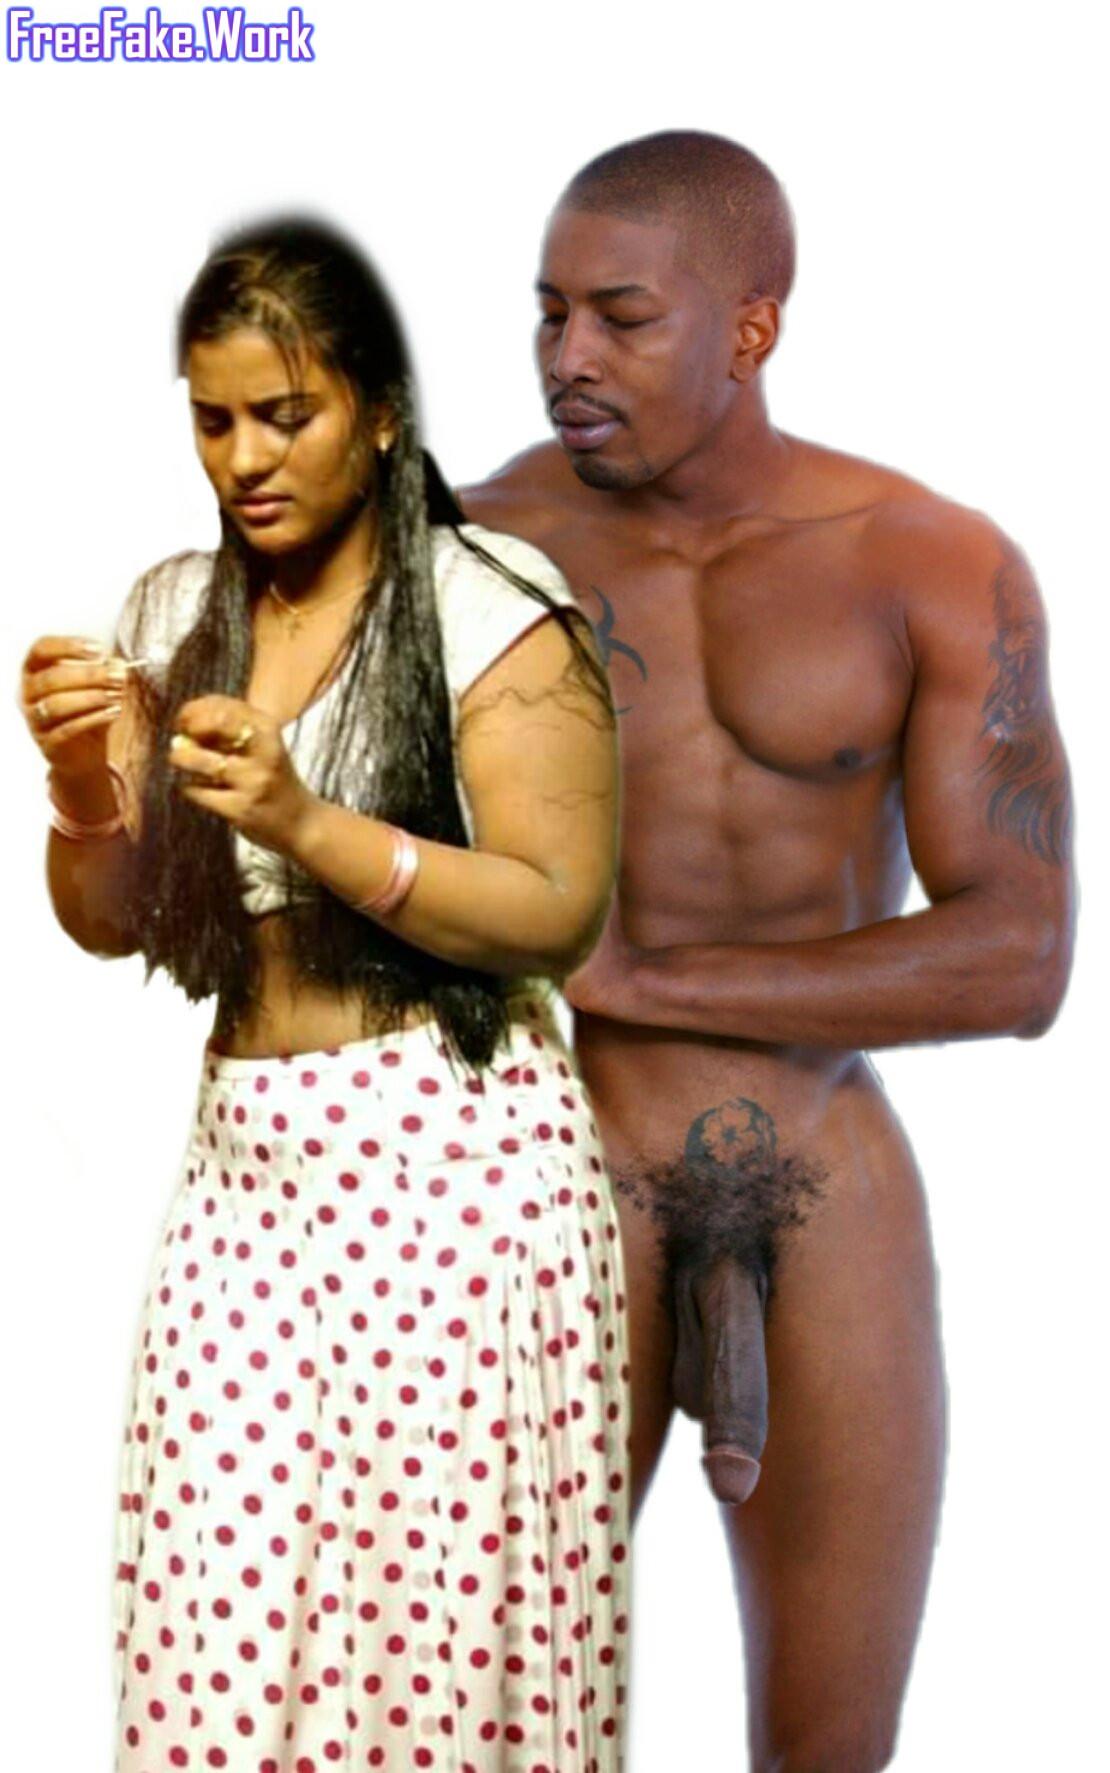 Aishwarya-Rajesh-semi-nude-forced-blacked-in-blouse-HQ-Instagram-pics.jpg